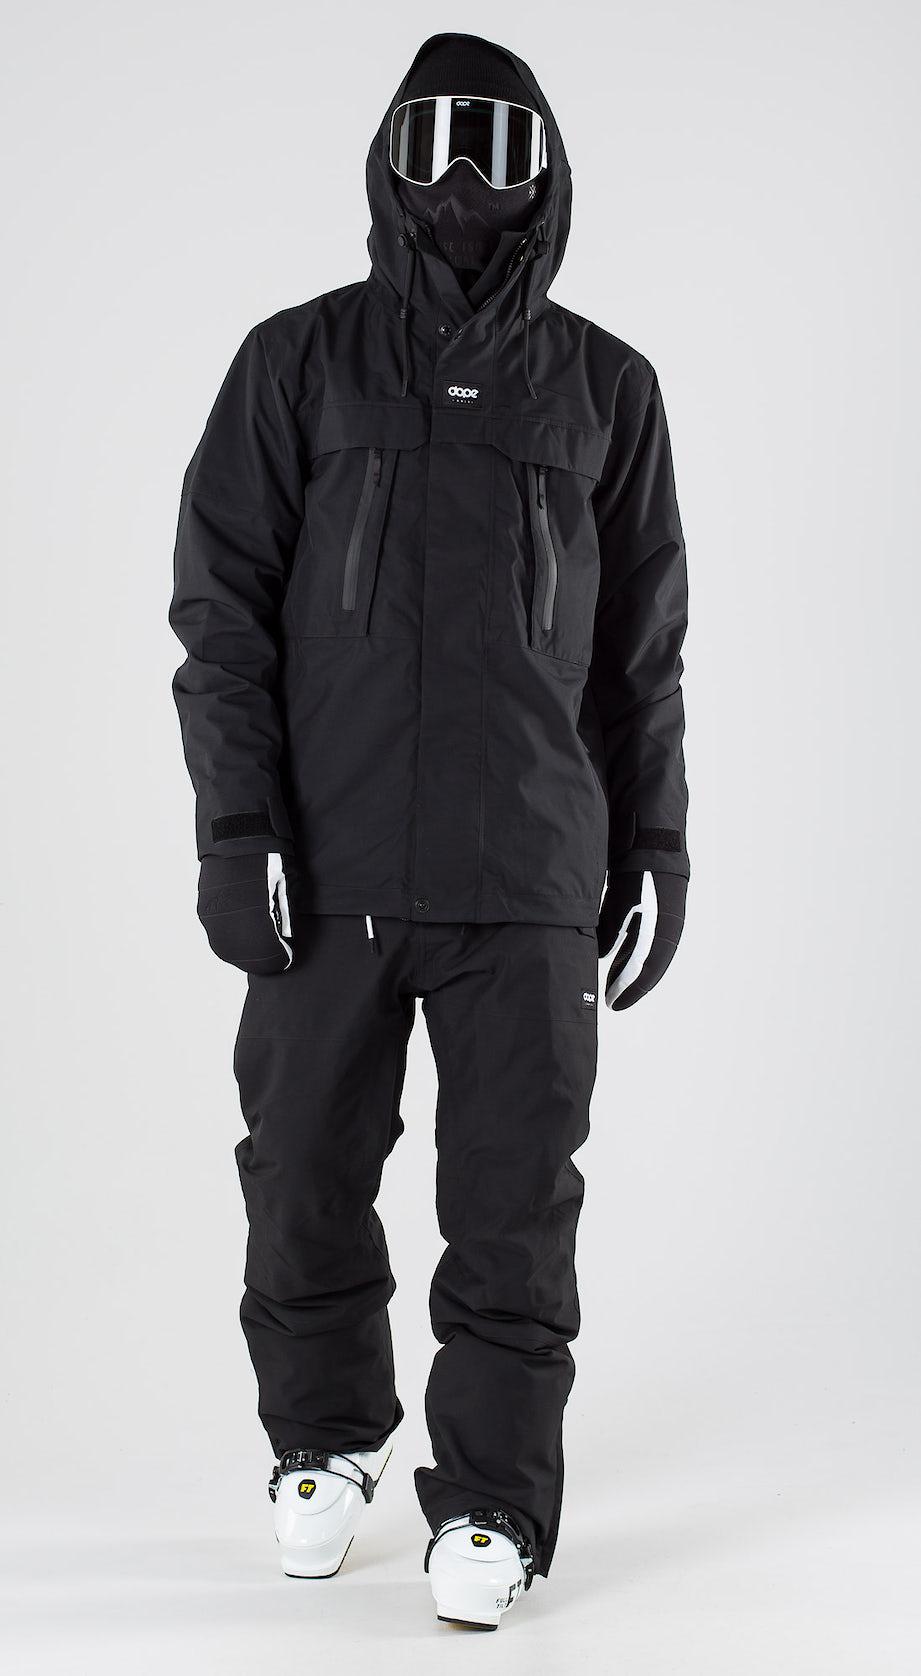 Dope Lunar Black Vêtements de ski Multi